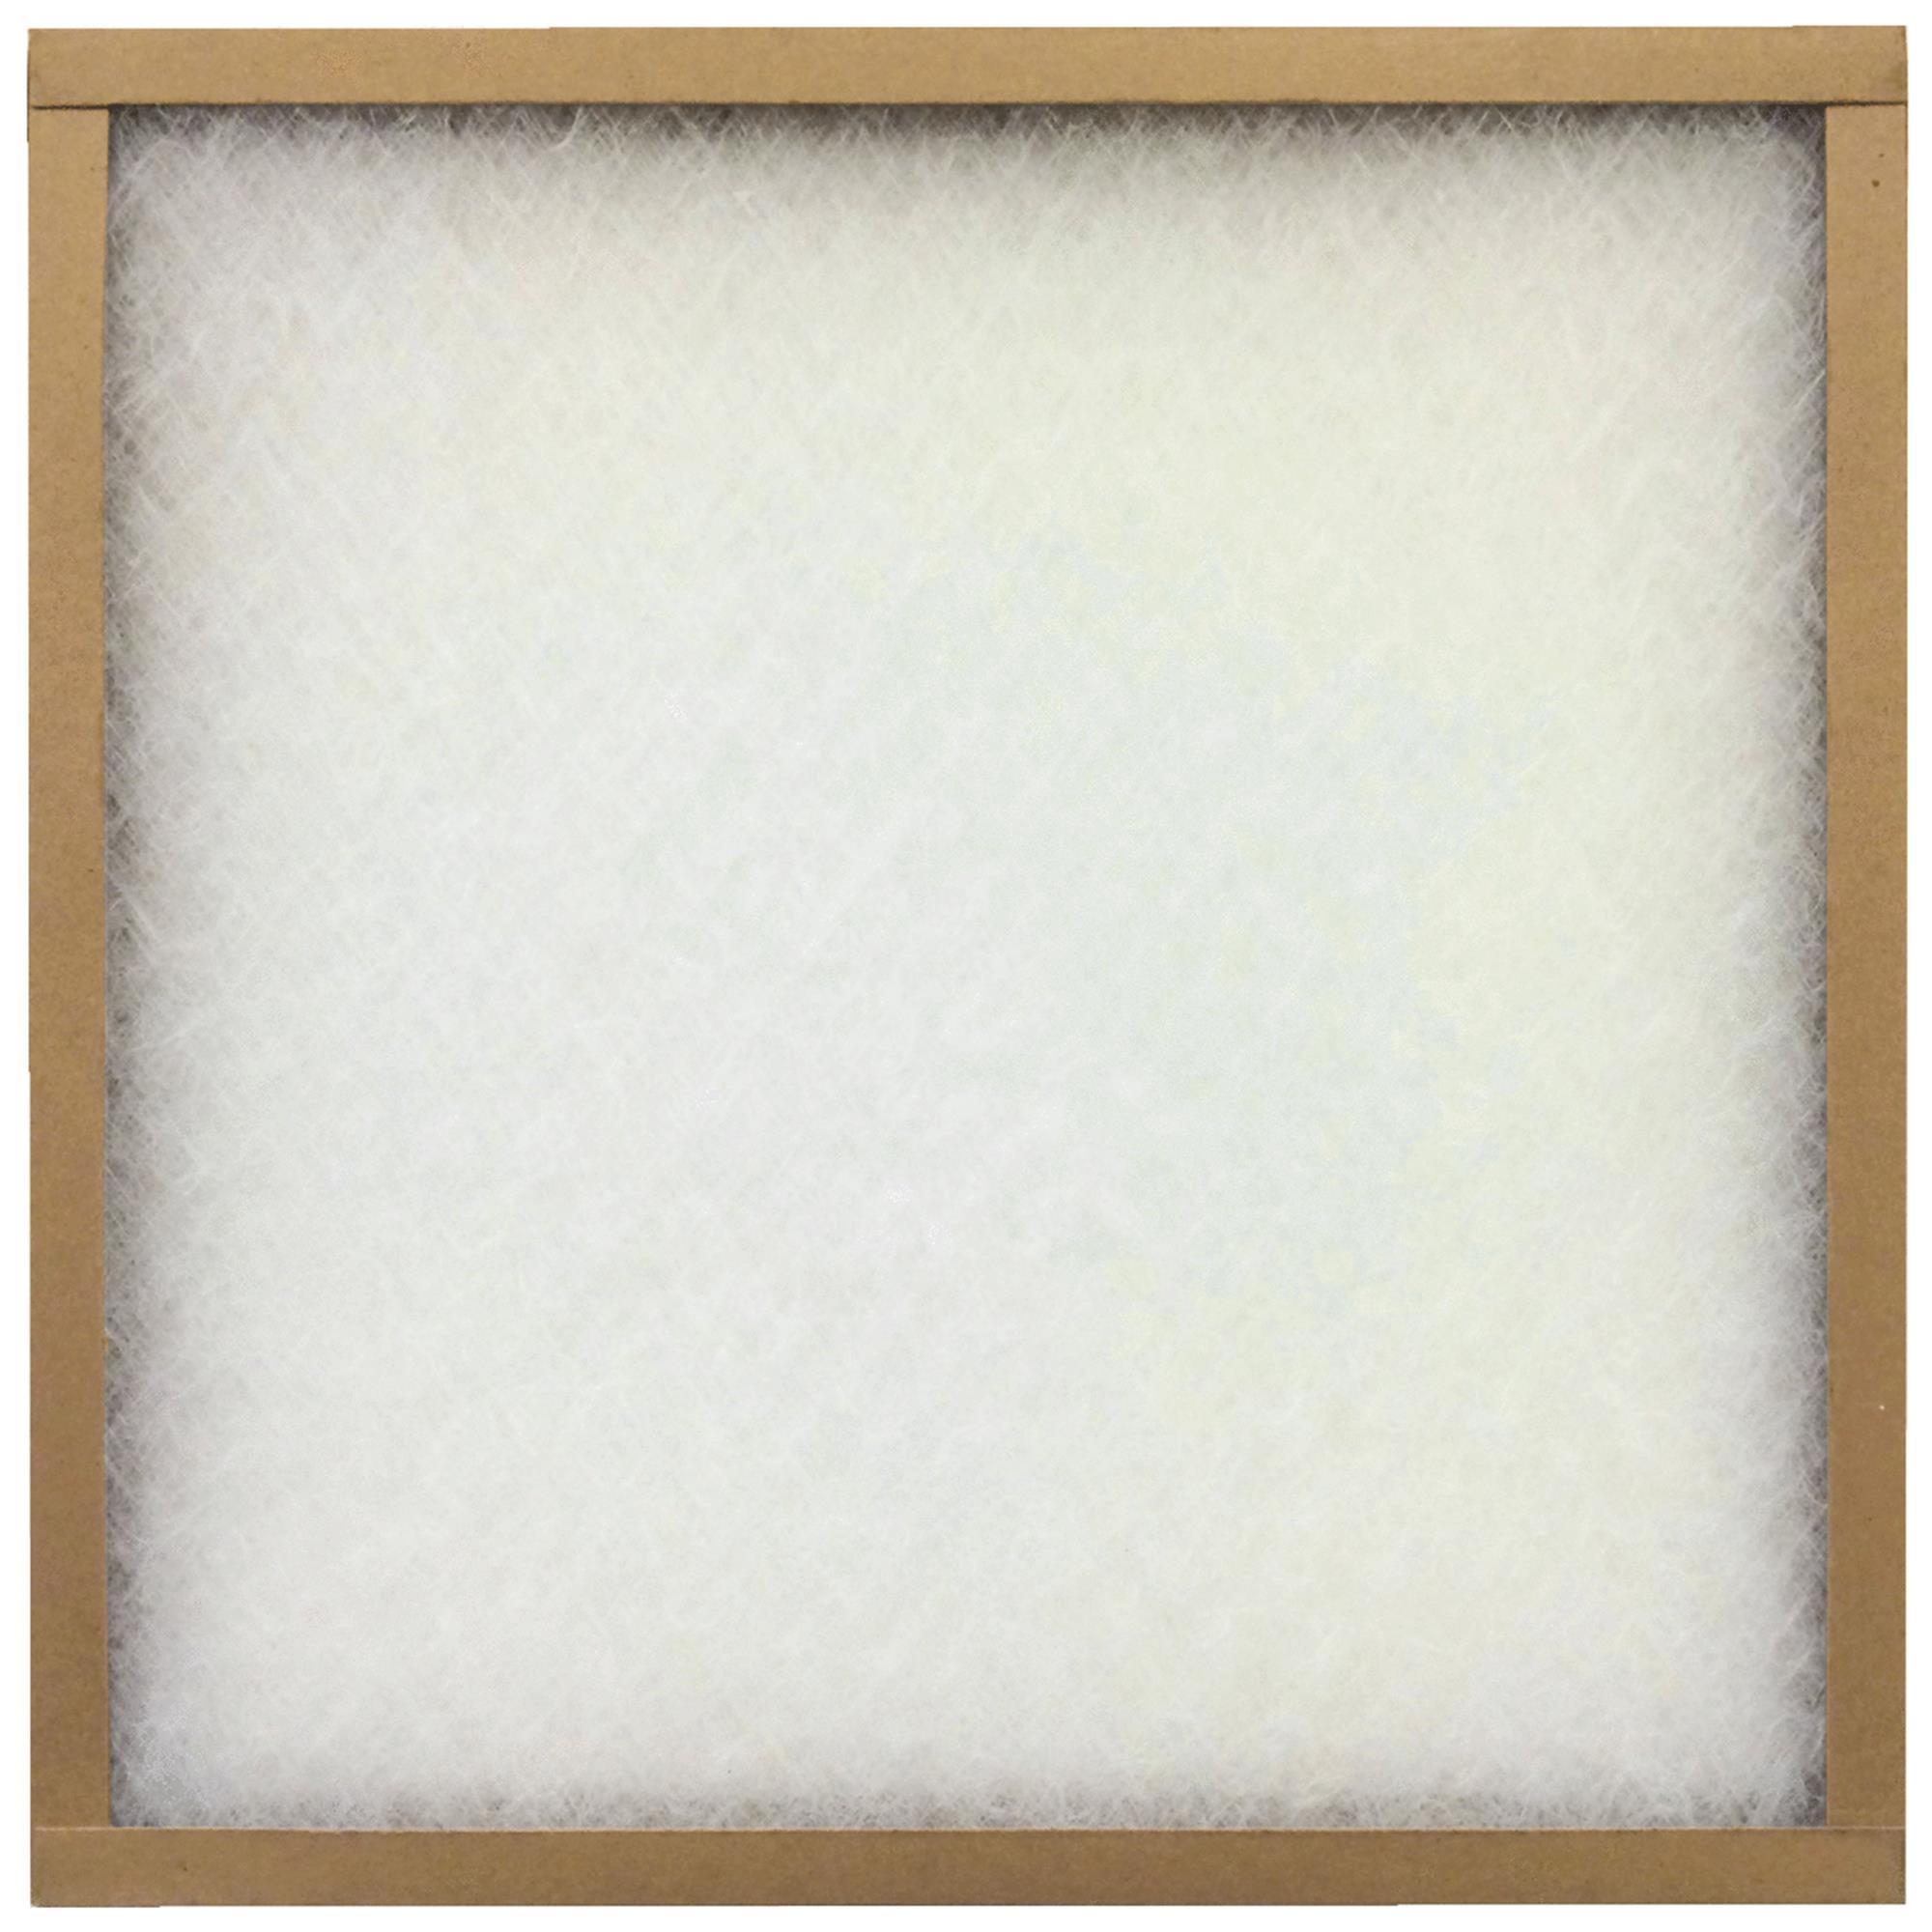 "Flanders EZ-Flow II (1 Filter), 14"" X 25"" X 1"" Flat Panel Furnace Air Filter"